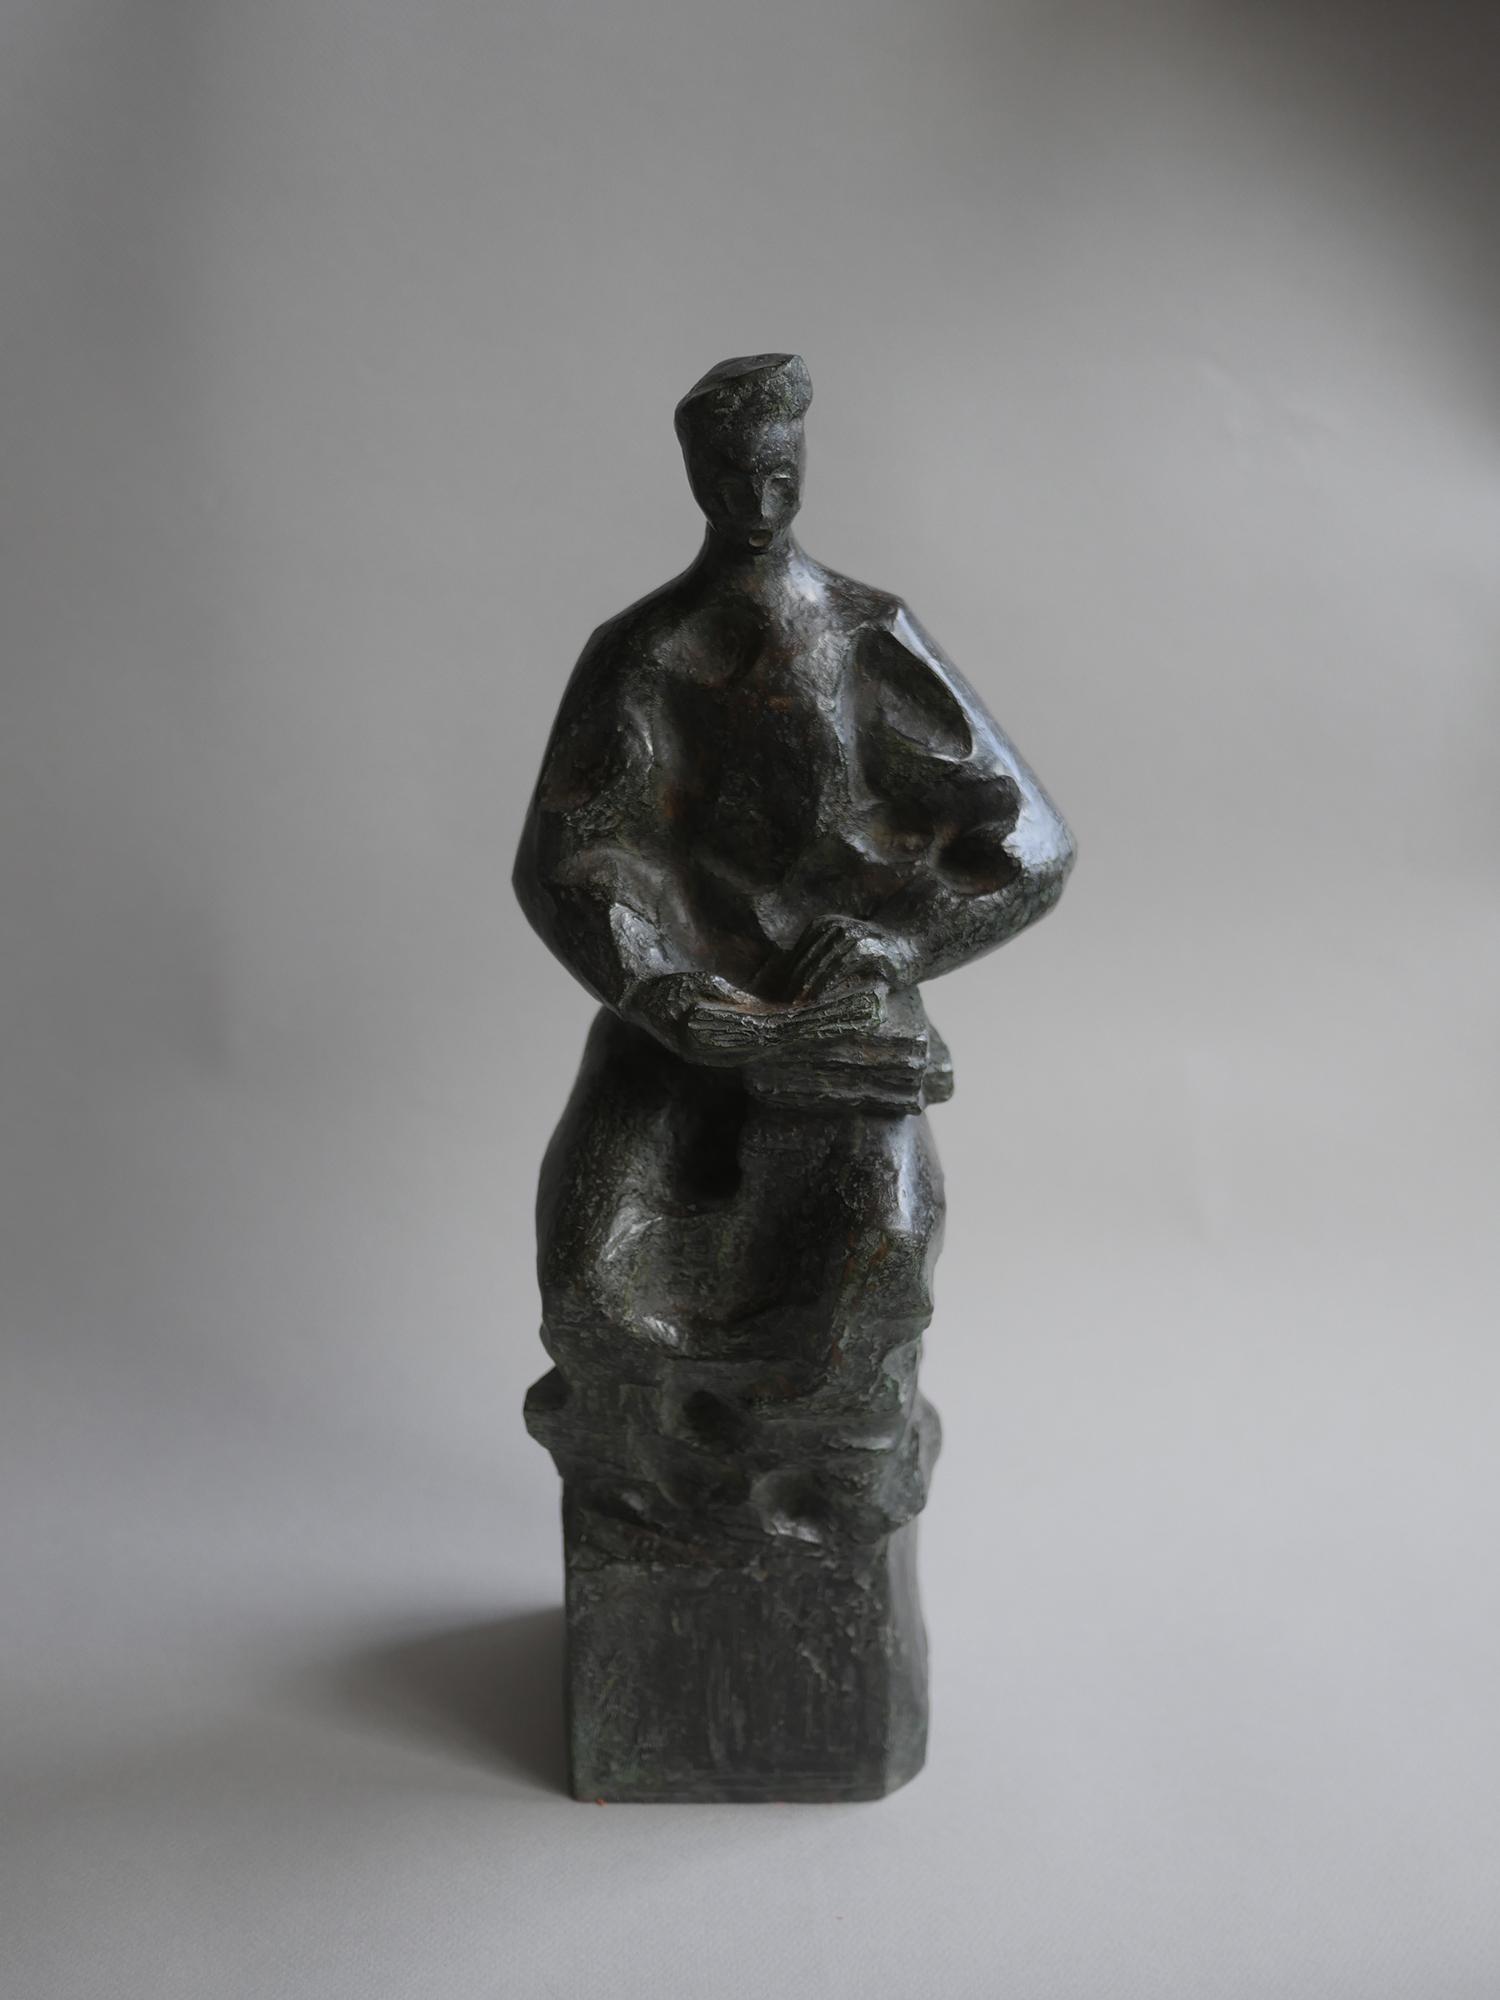 1987. Cantor de salmos, Mayólica, 44x17x16 cms. 1987